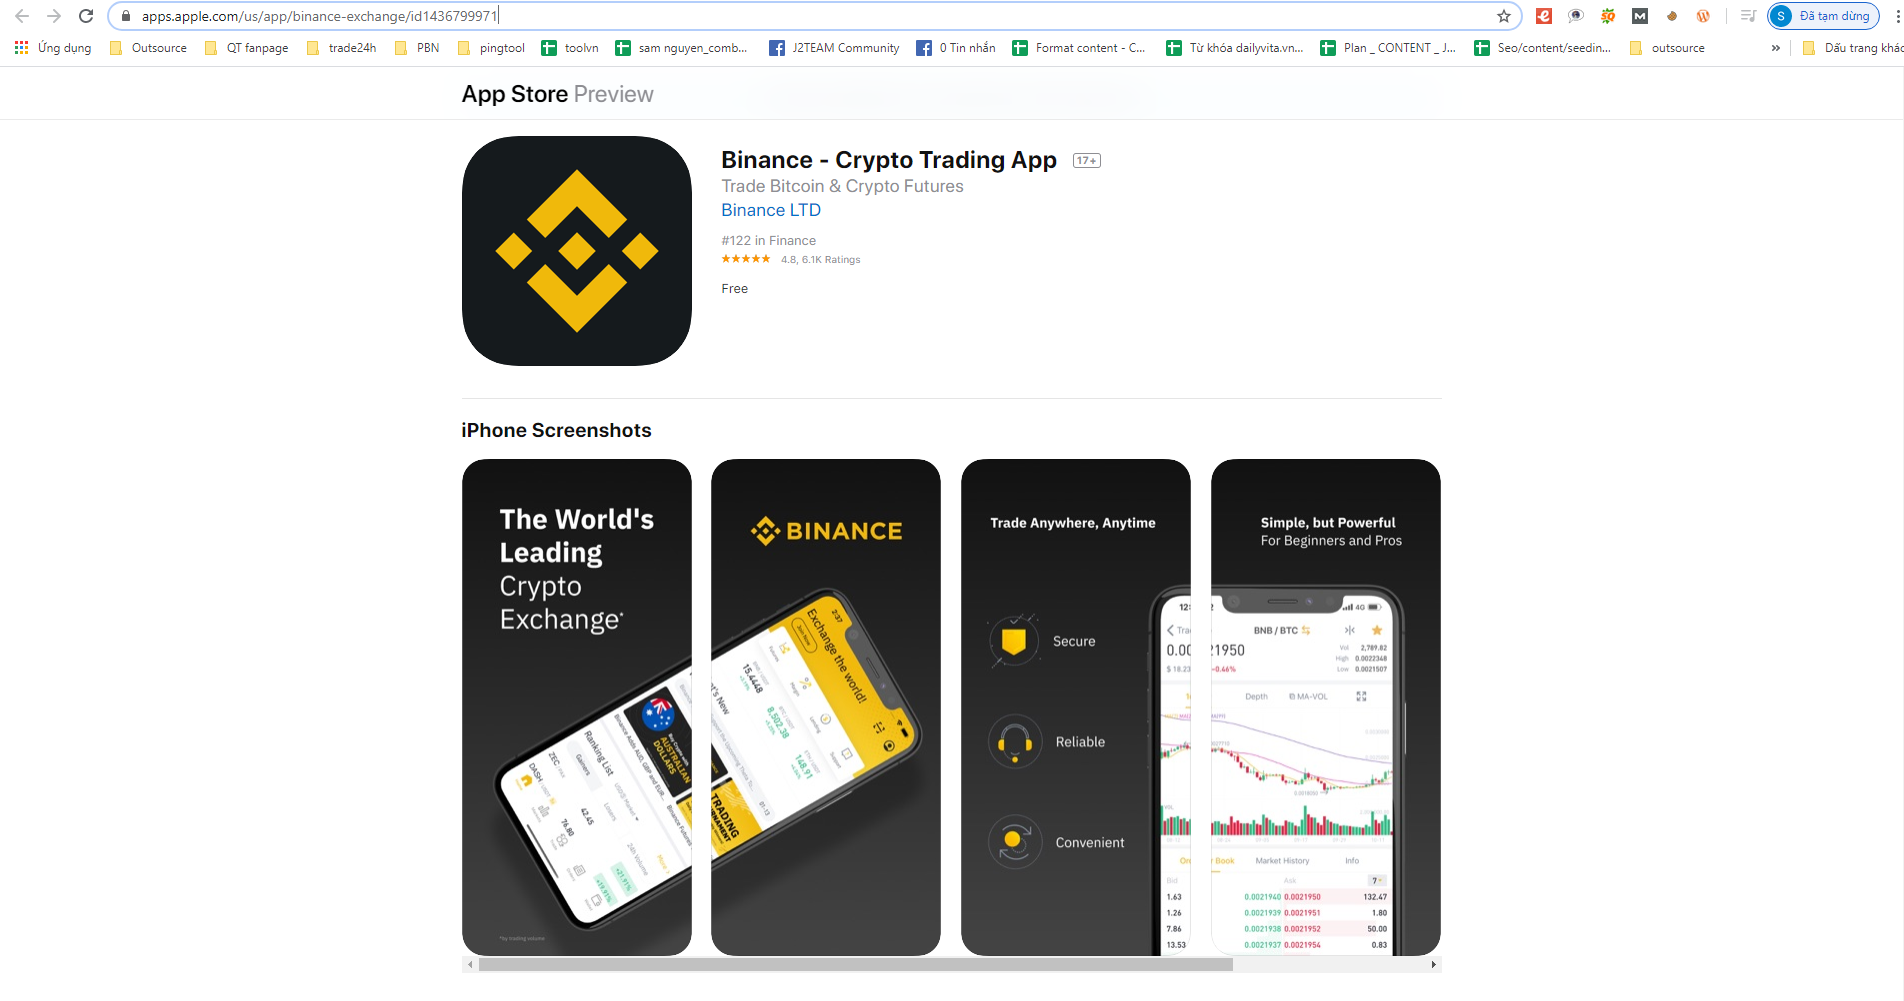 Tải ứng dụng Binance trên App Store